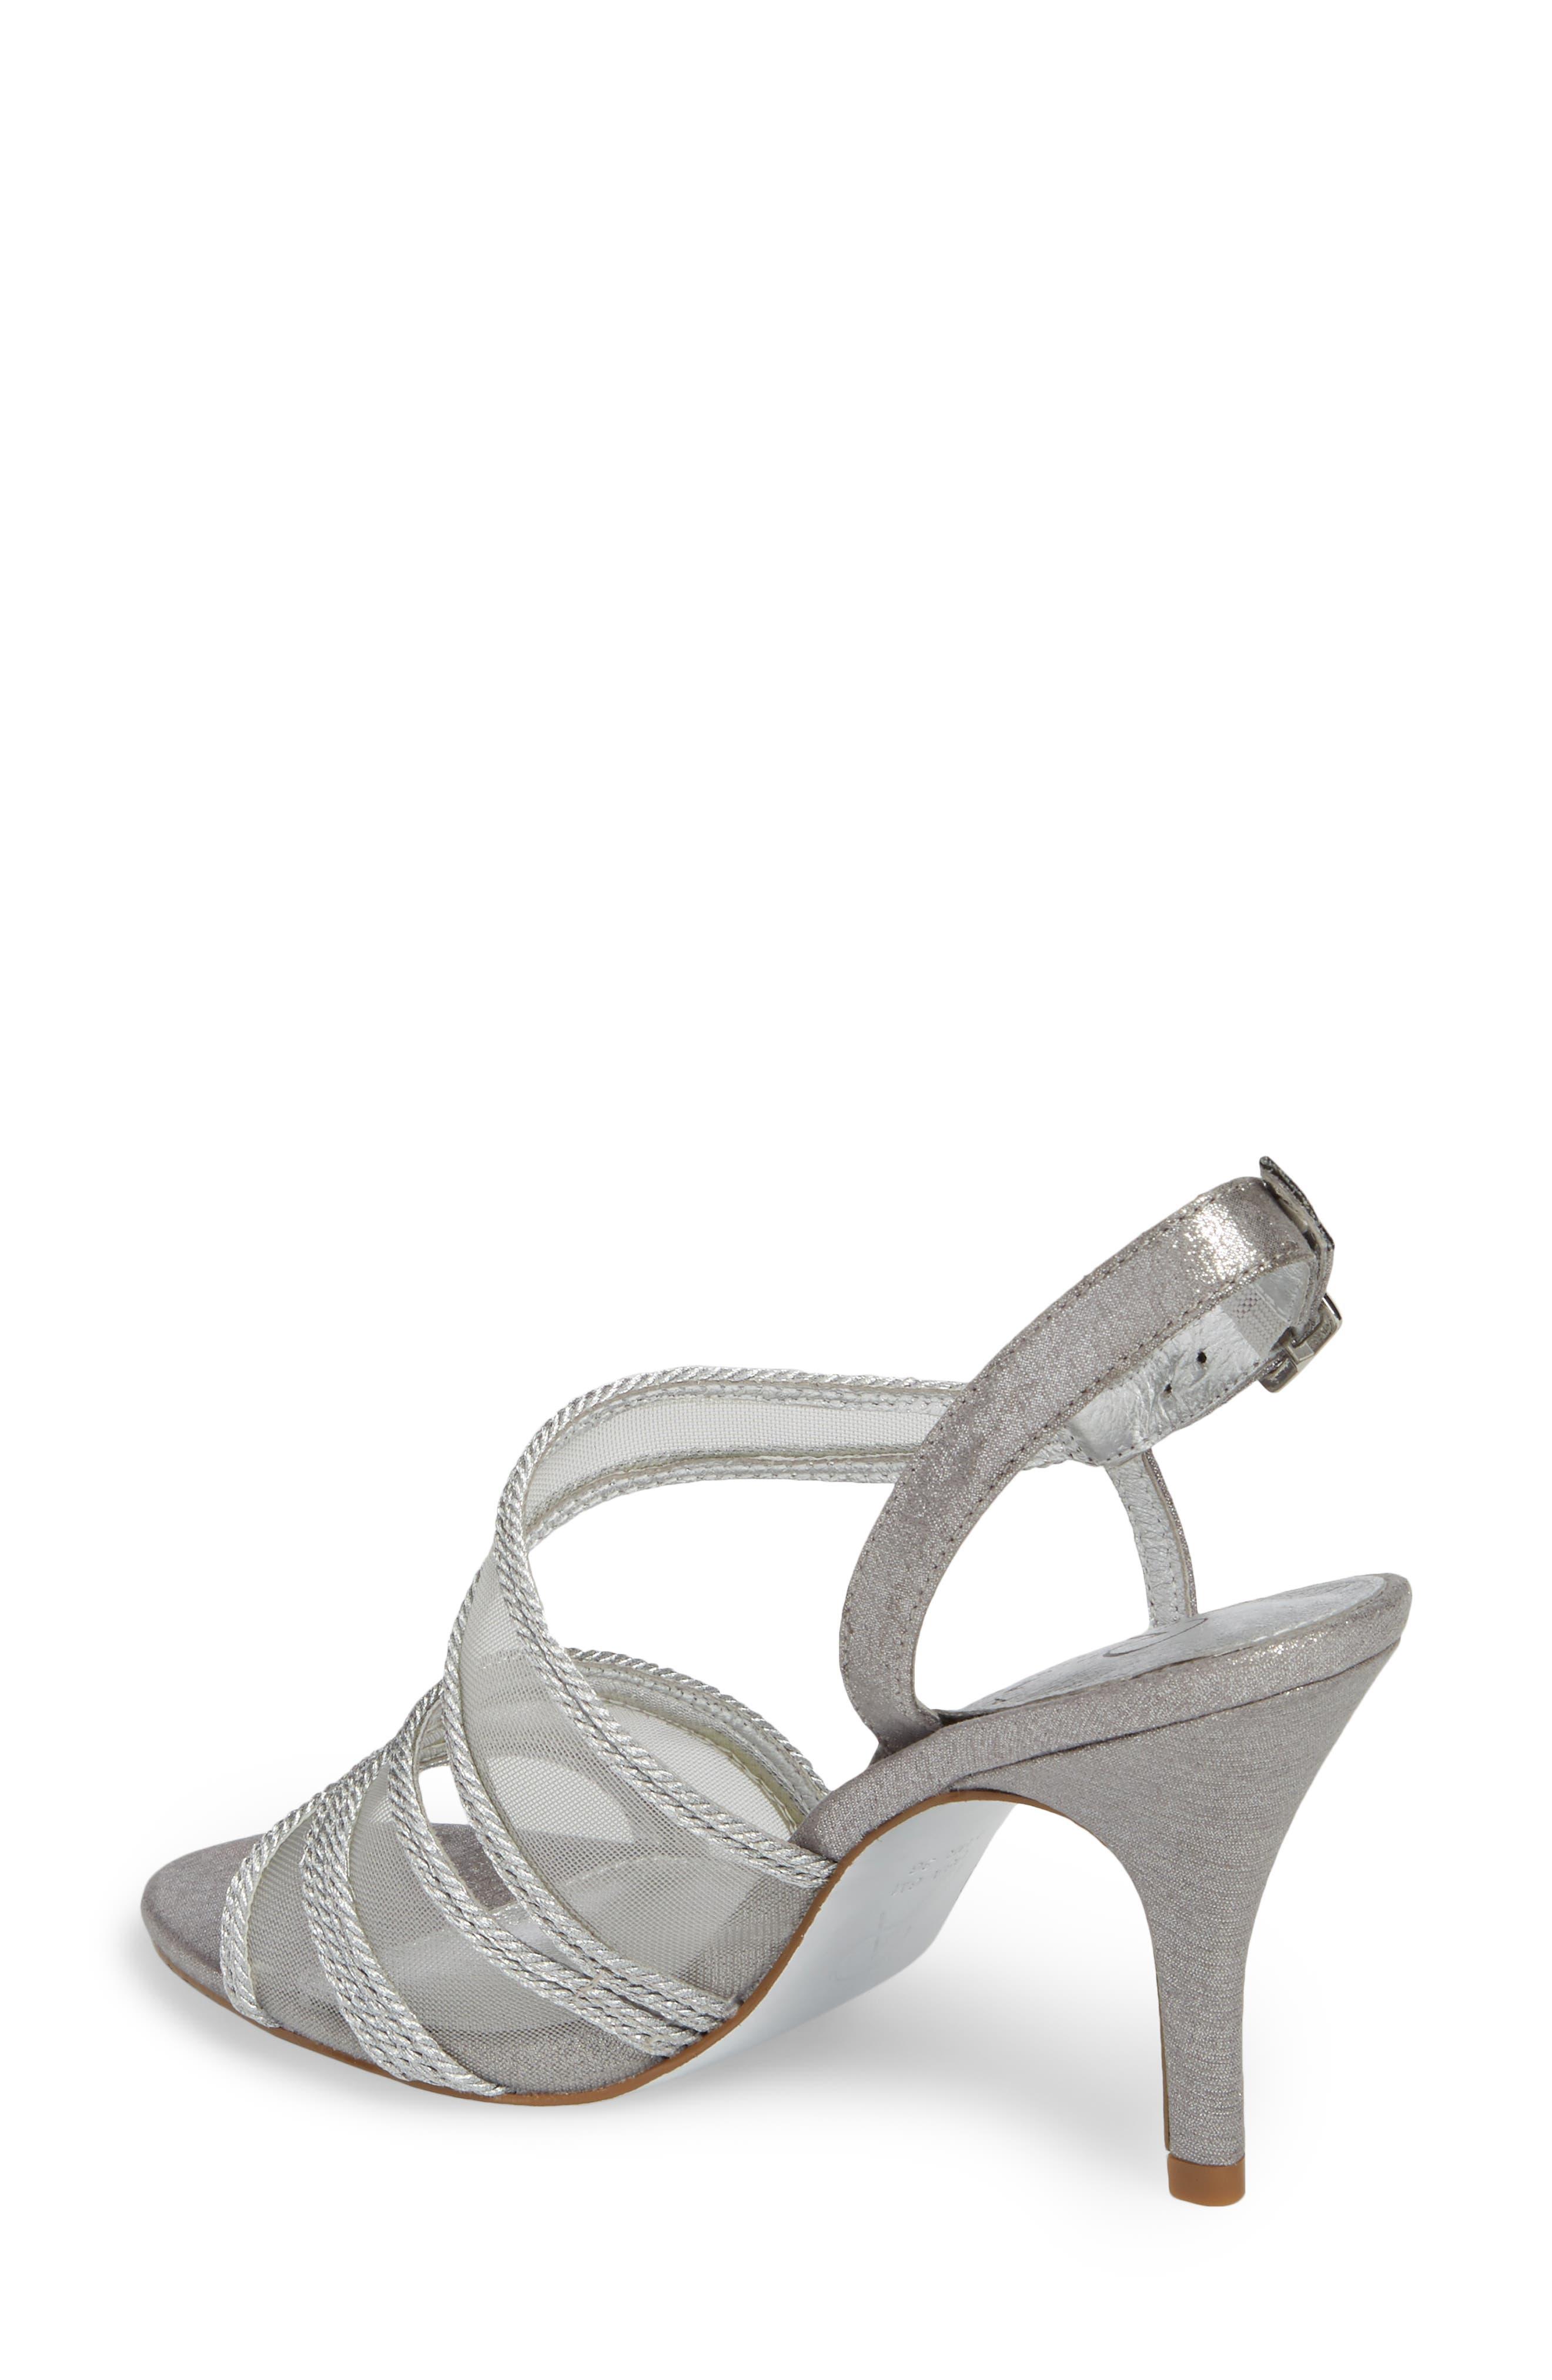 Adelphi Asymmetrical Mesh Sandal,                             Alternate thumbnail 5, color,